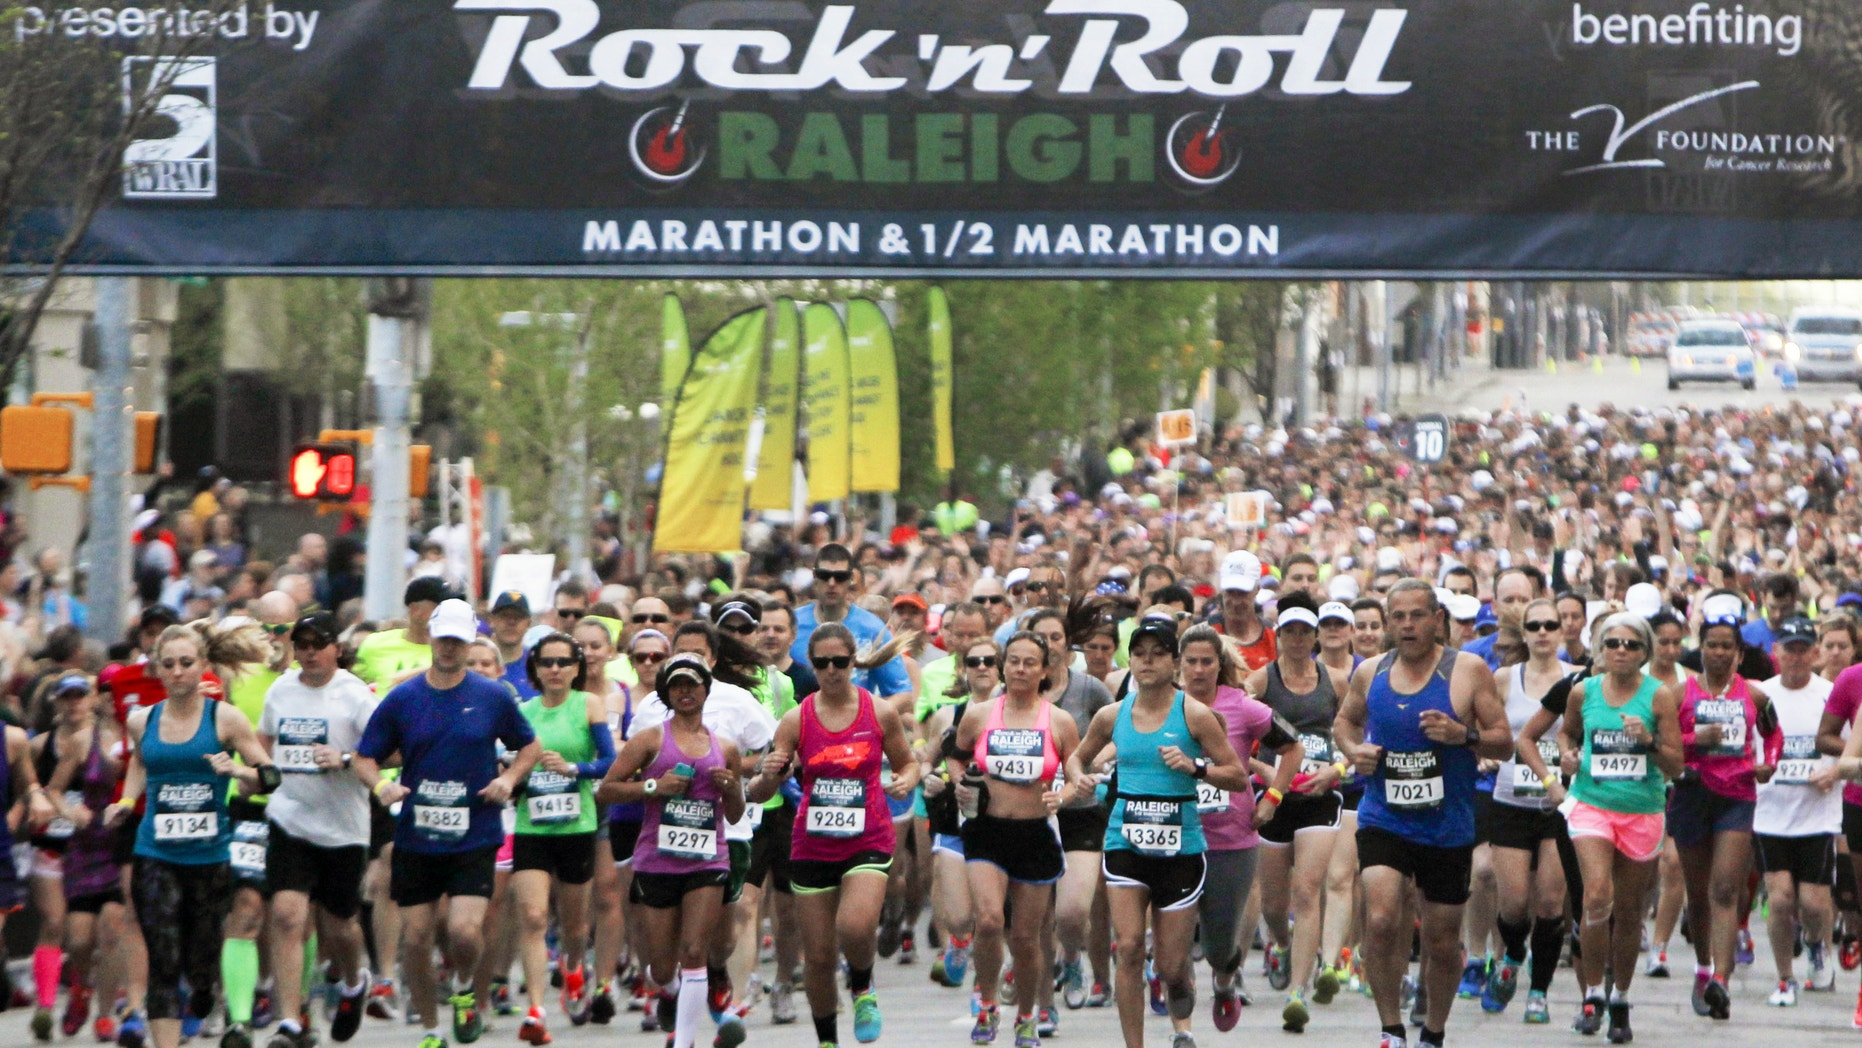 Runners head down Salisbury Street in Raleigh, N.C. during the Raleigh Rock 'n' Roll Marathon & Half Marathon, Sunday, April 13, 2014. Authorities say two runners died near the finish line of the half marathon.